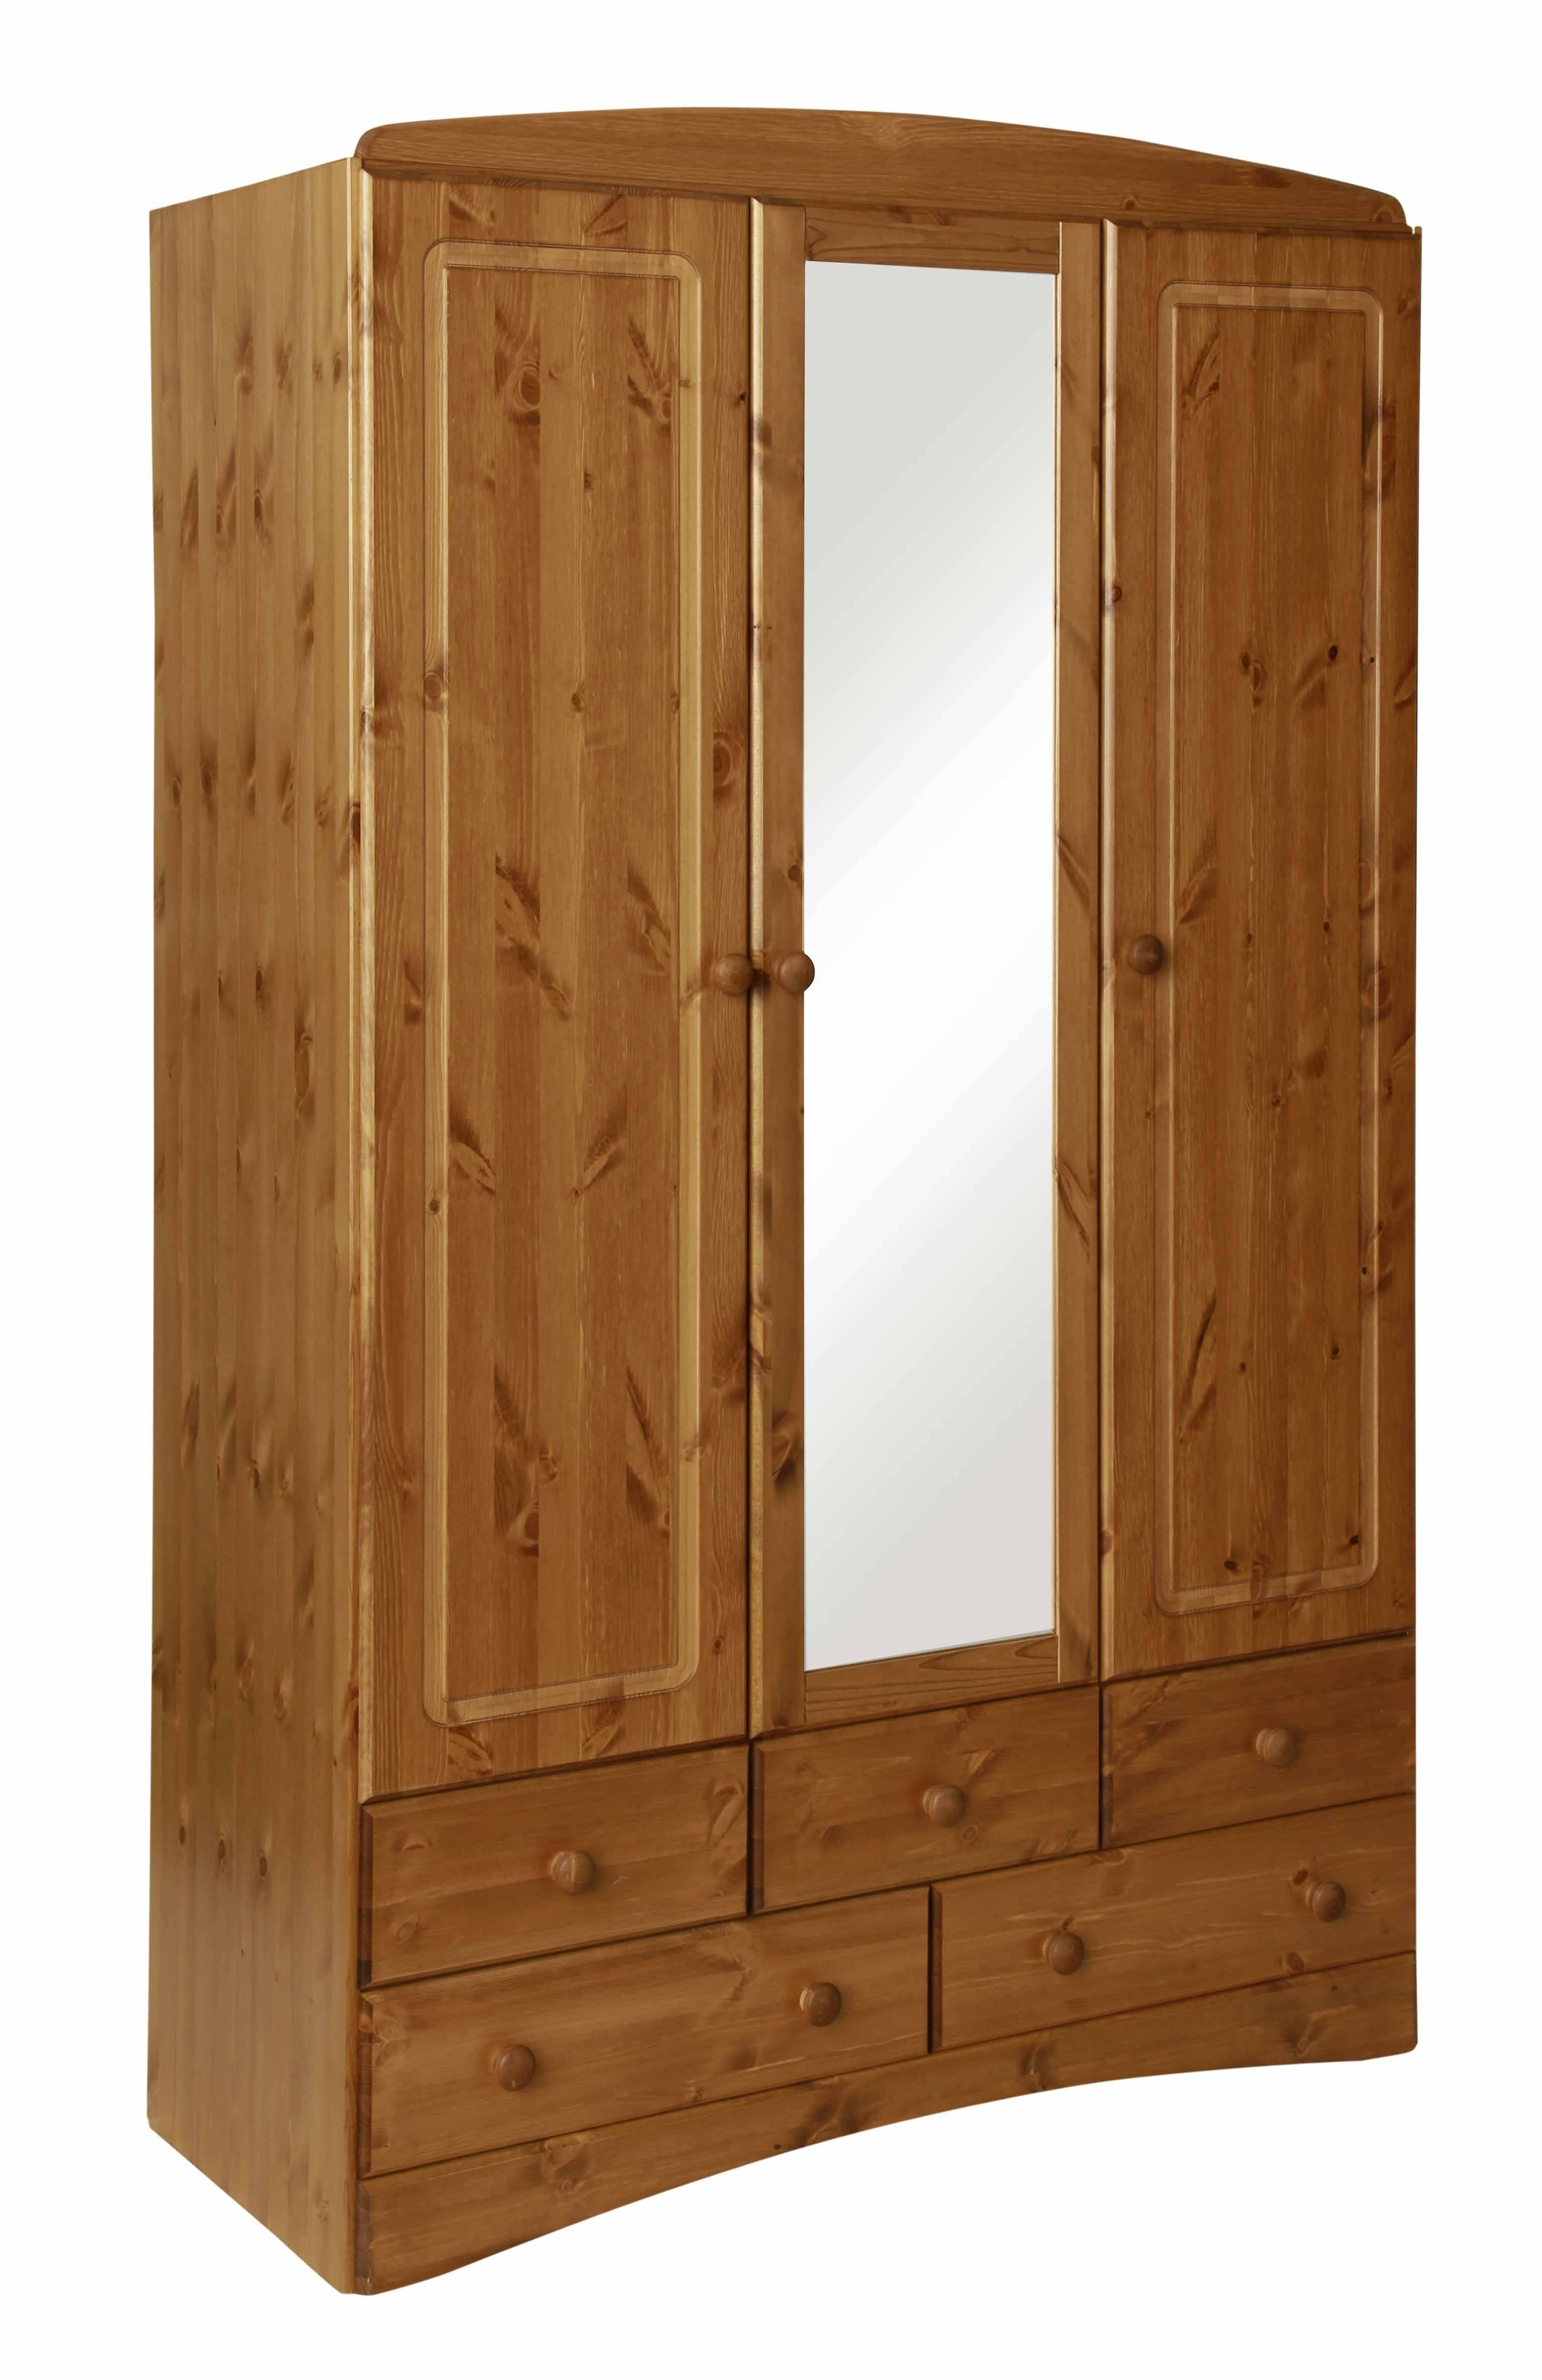 Scandi Pine 3 Door 5 Drawer Wardrobe With Mirror With 3 Door Pine Wardrobes (View 13 of 15)